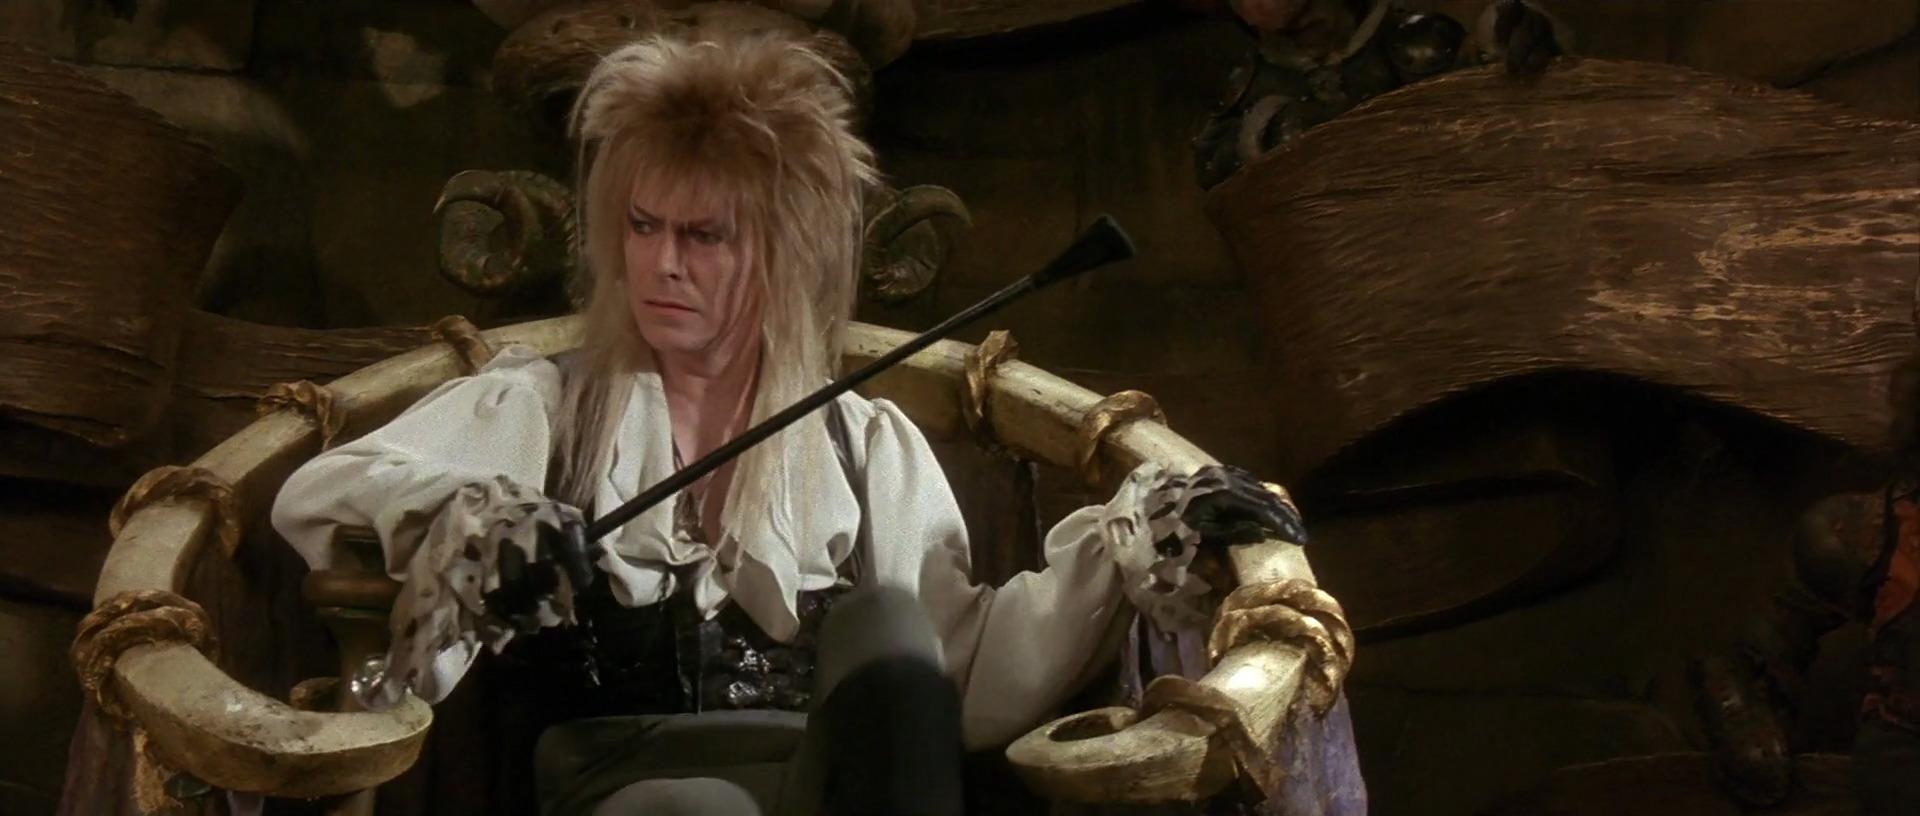 labyrinth-movie-screencaps.com-2422.jpg